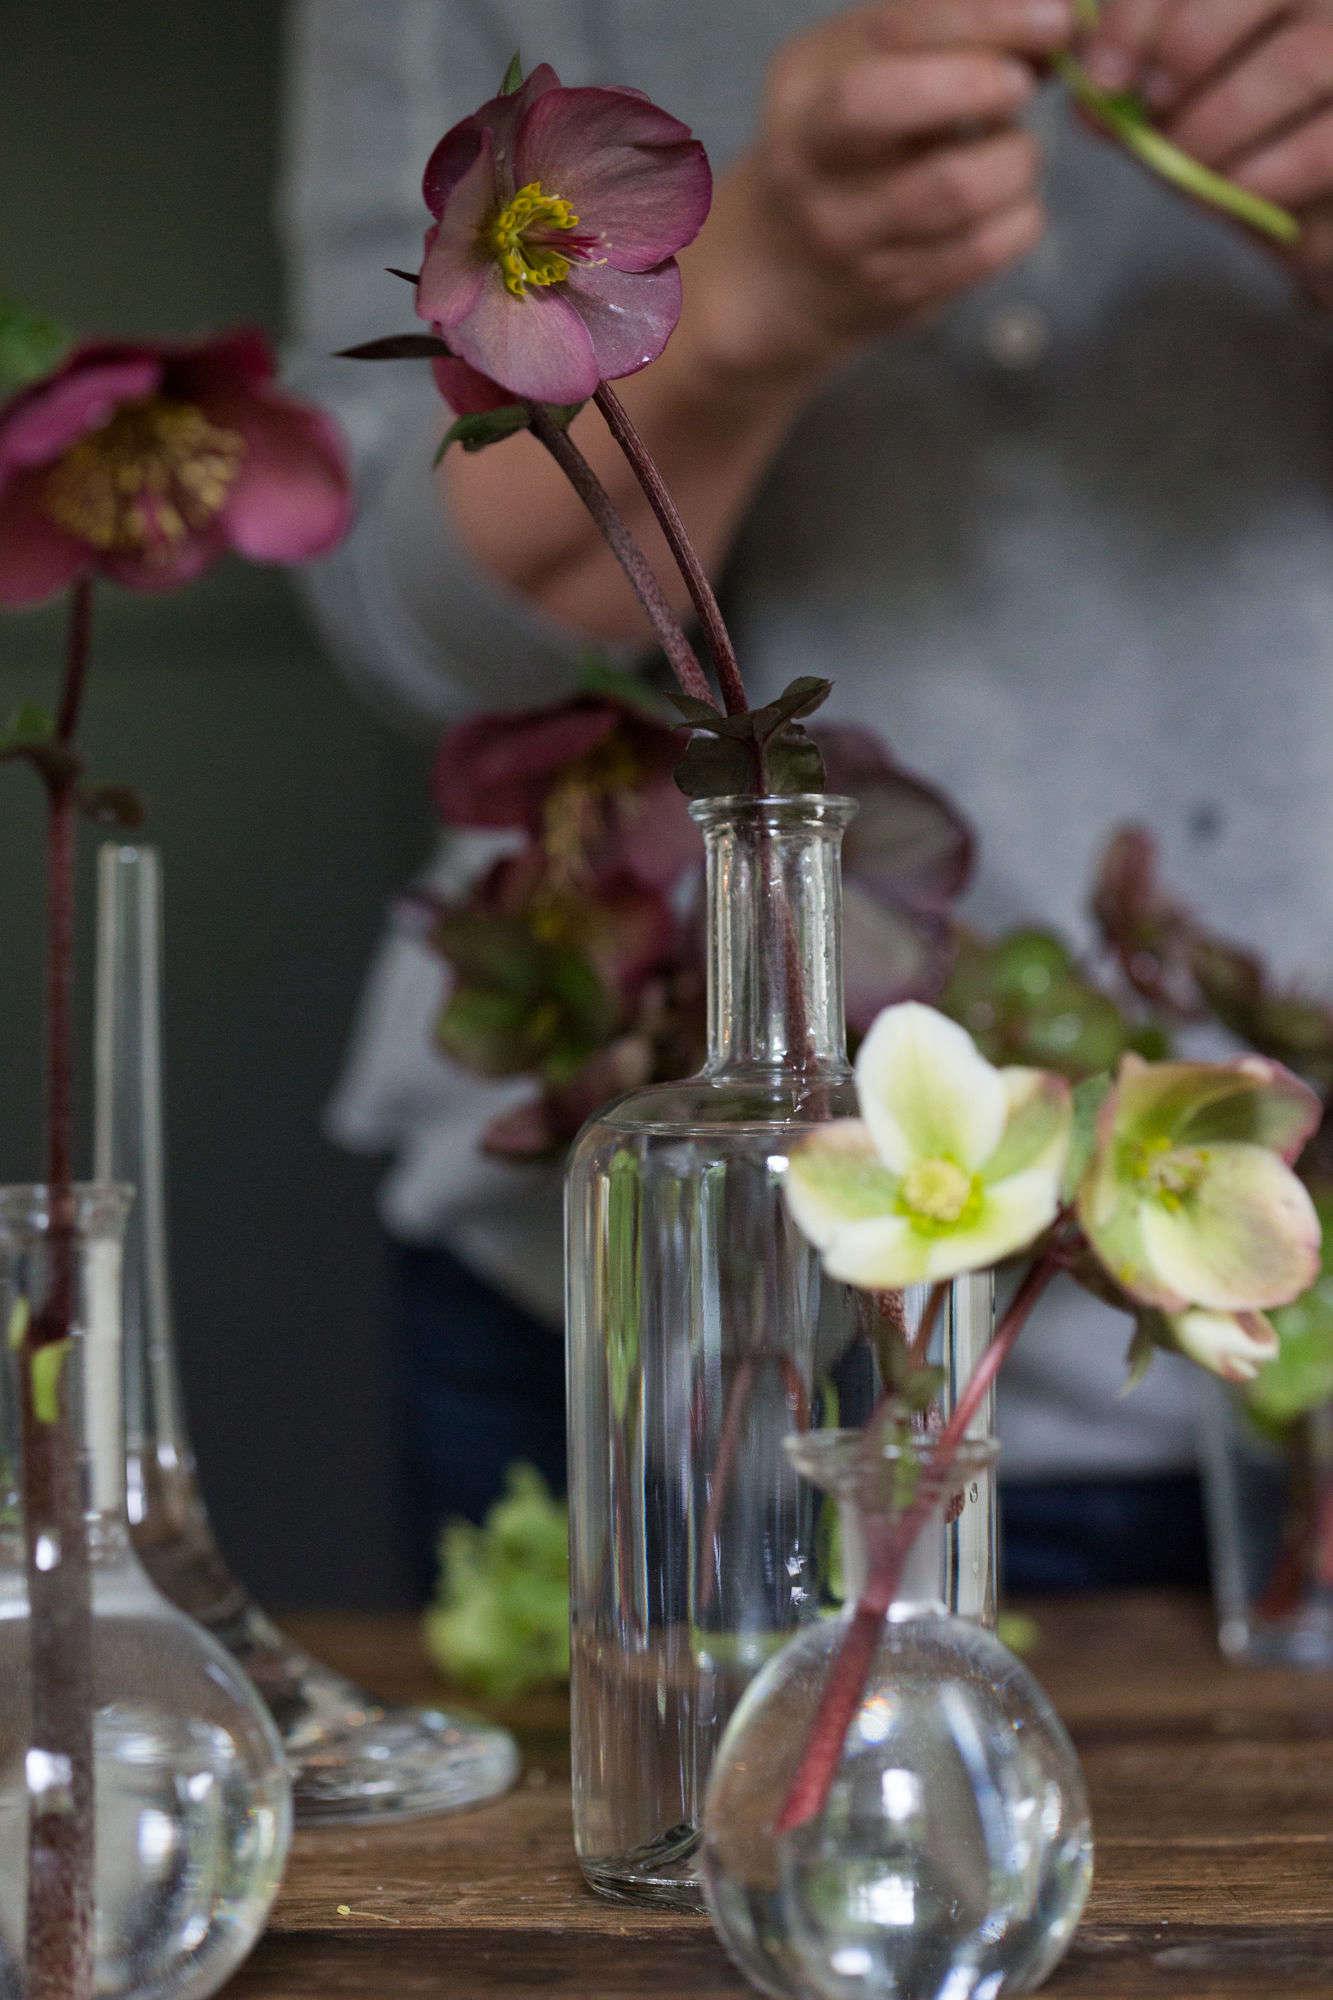 Cut flowers how to help hellebores last longer gardenista hellebores in clean vases of cool water izmirmasajfo